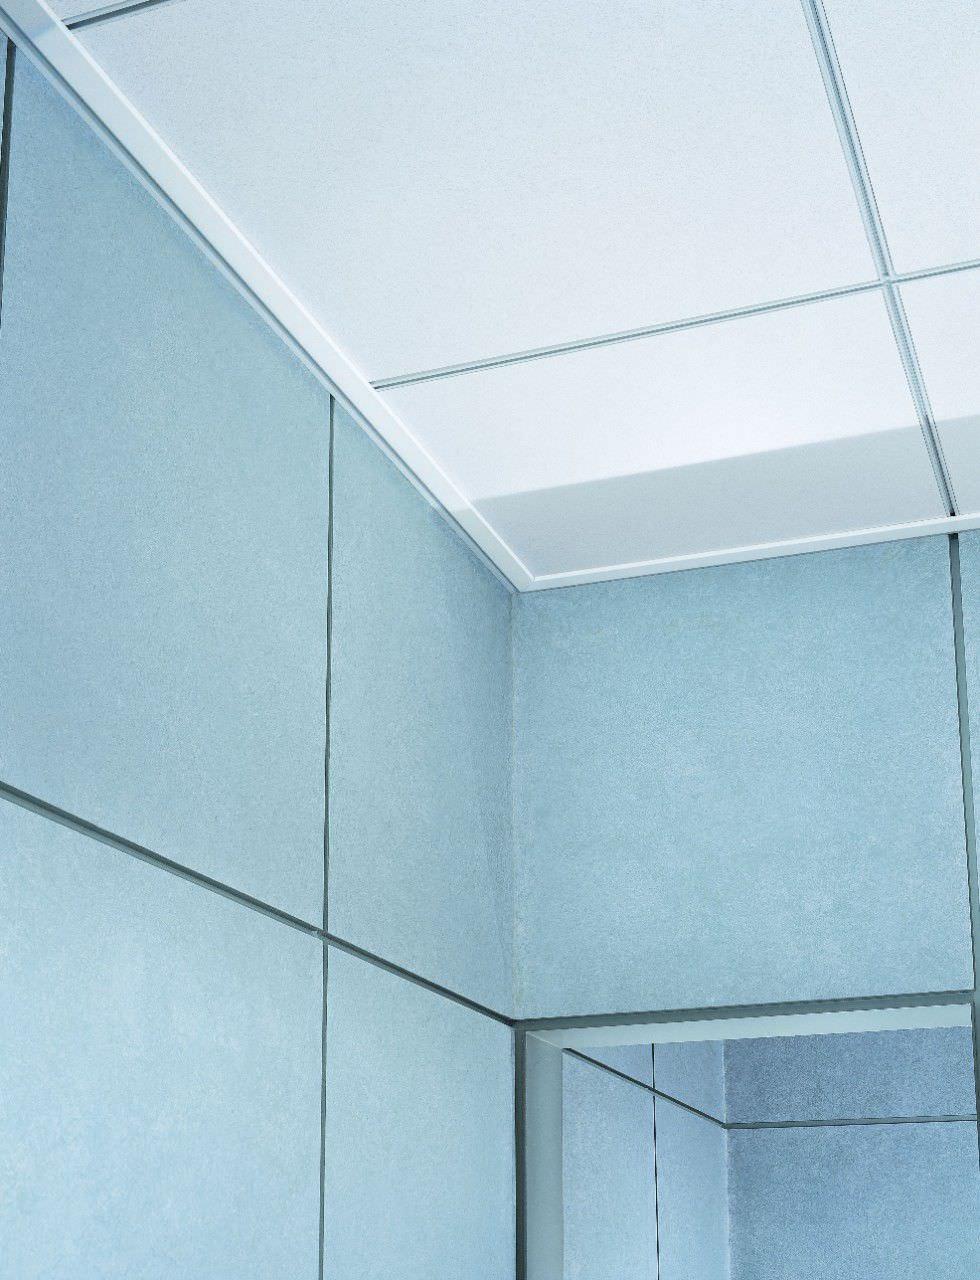 Mineral fiber suspended ceiling / panel / acoustic - ASTRO® - USG